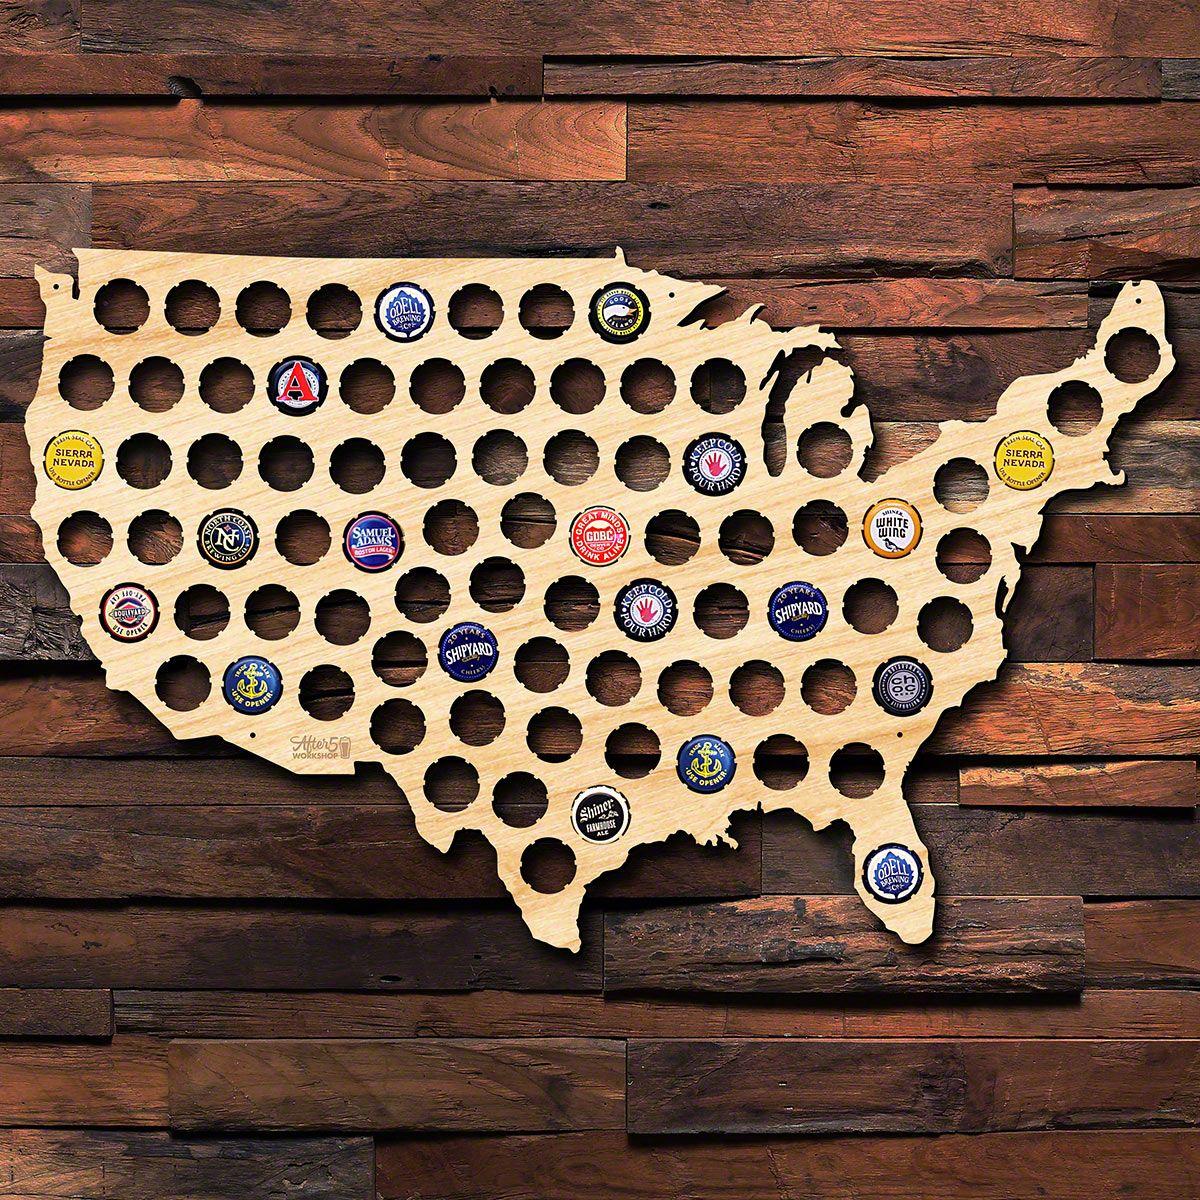 South Carolina Beer Cap Map Laser Cut Birch Wood Man Cave Craft Beer Cap Holder